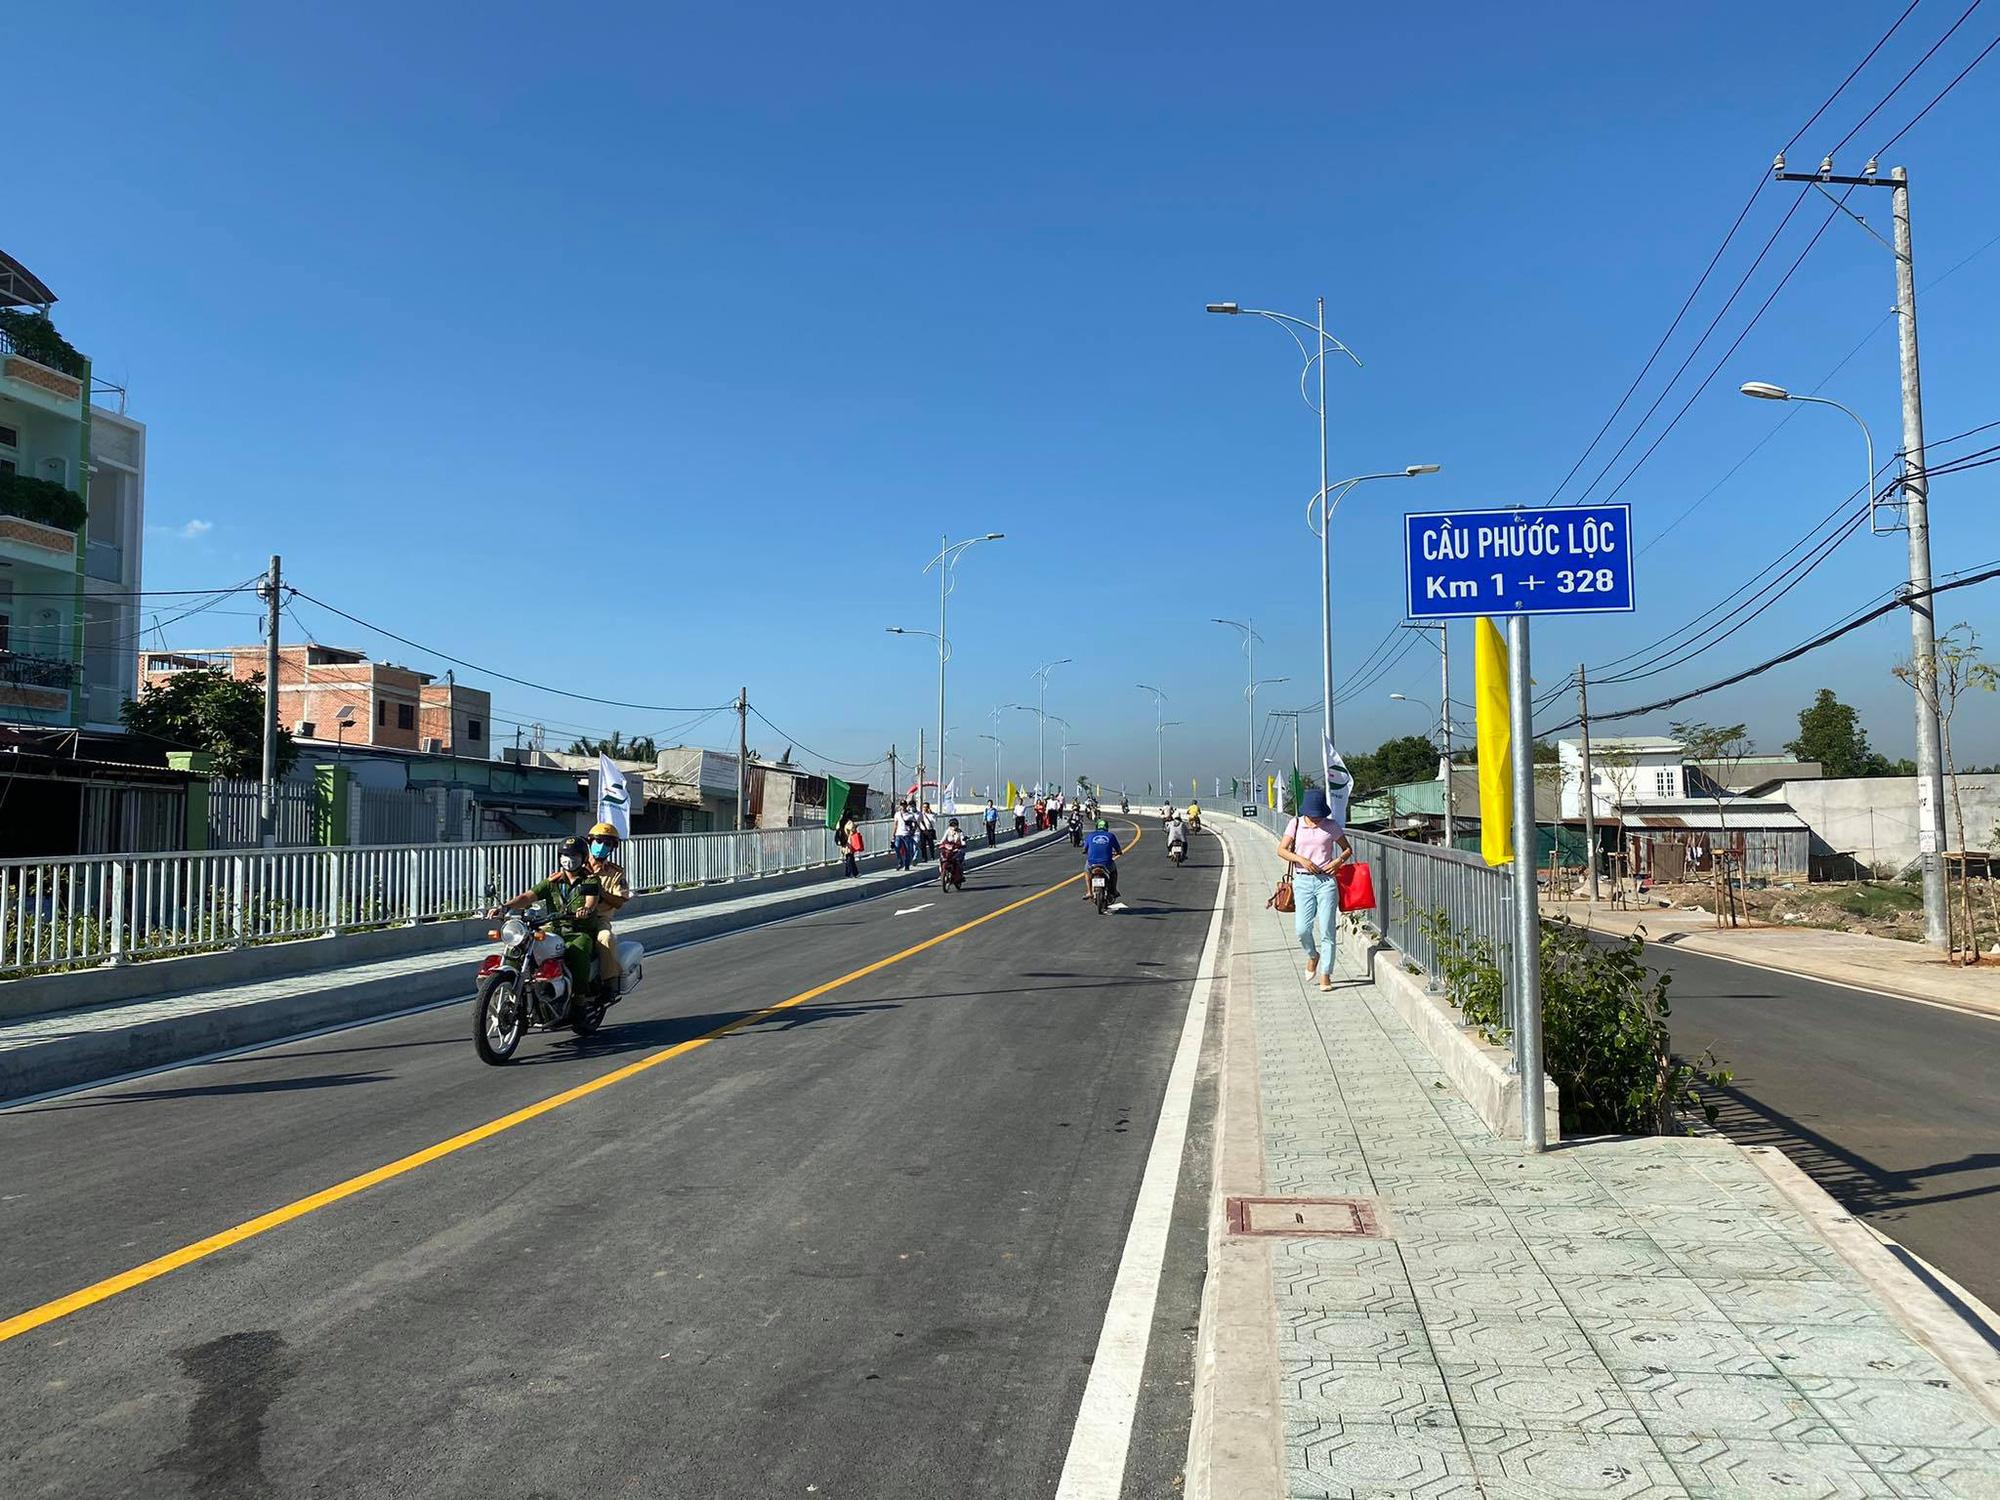 $17mn bridge inaugurated following 8-year-long construction on Ho Chi Minh City outskirts